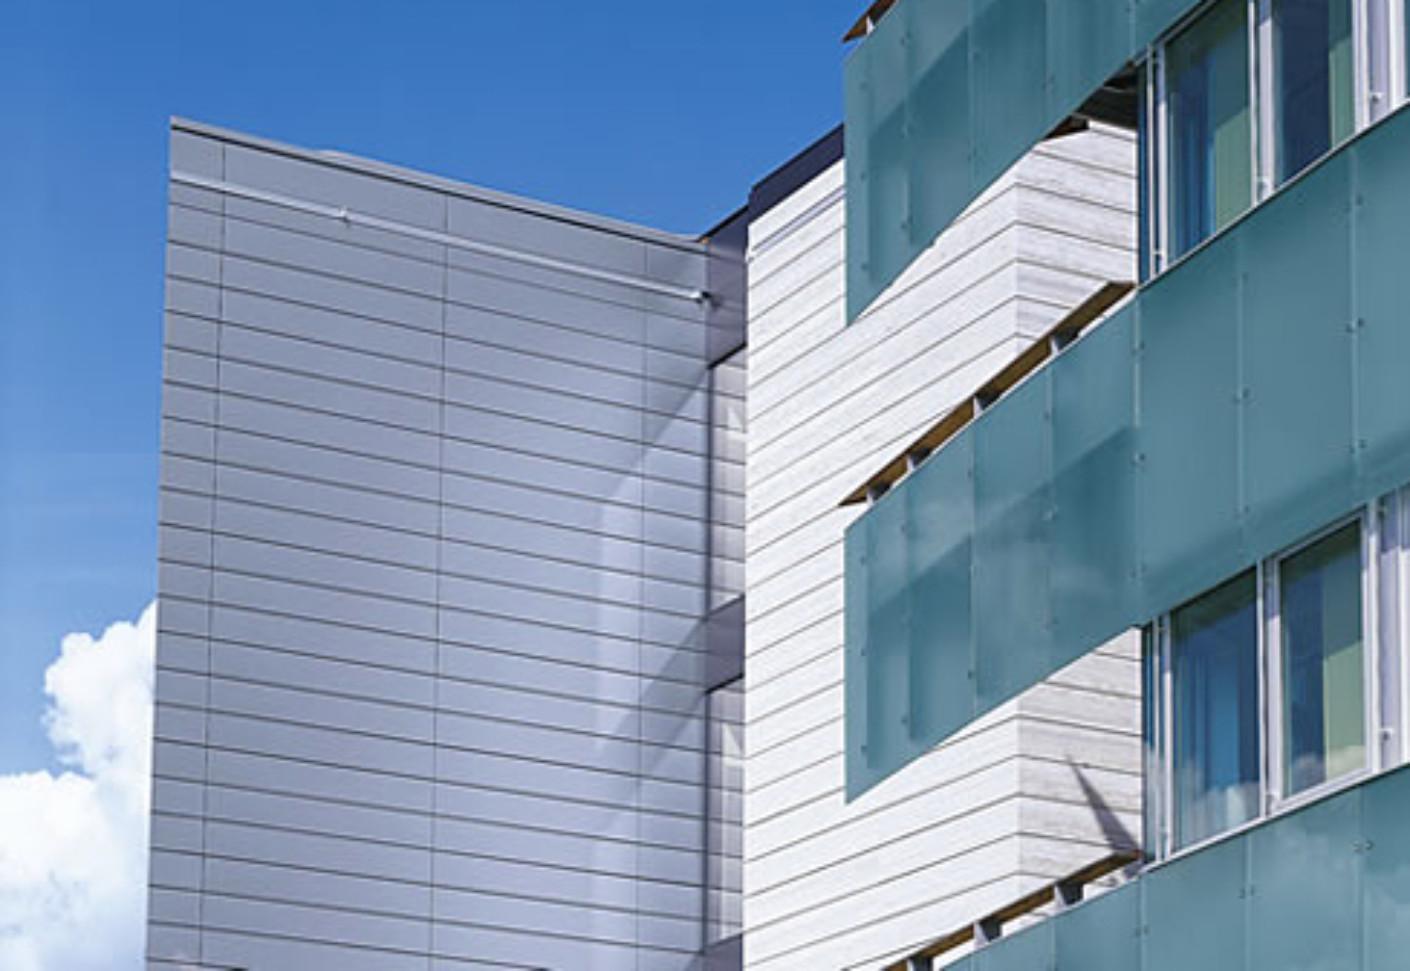 Shiplap Panel pre-weathered-pro blue grey by Rheinzink